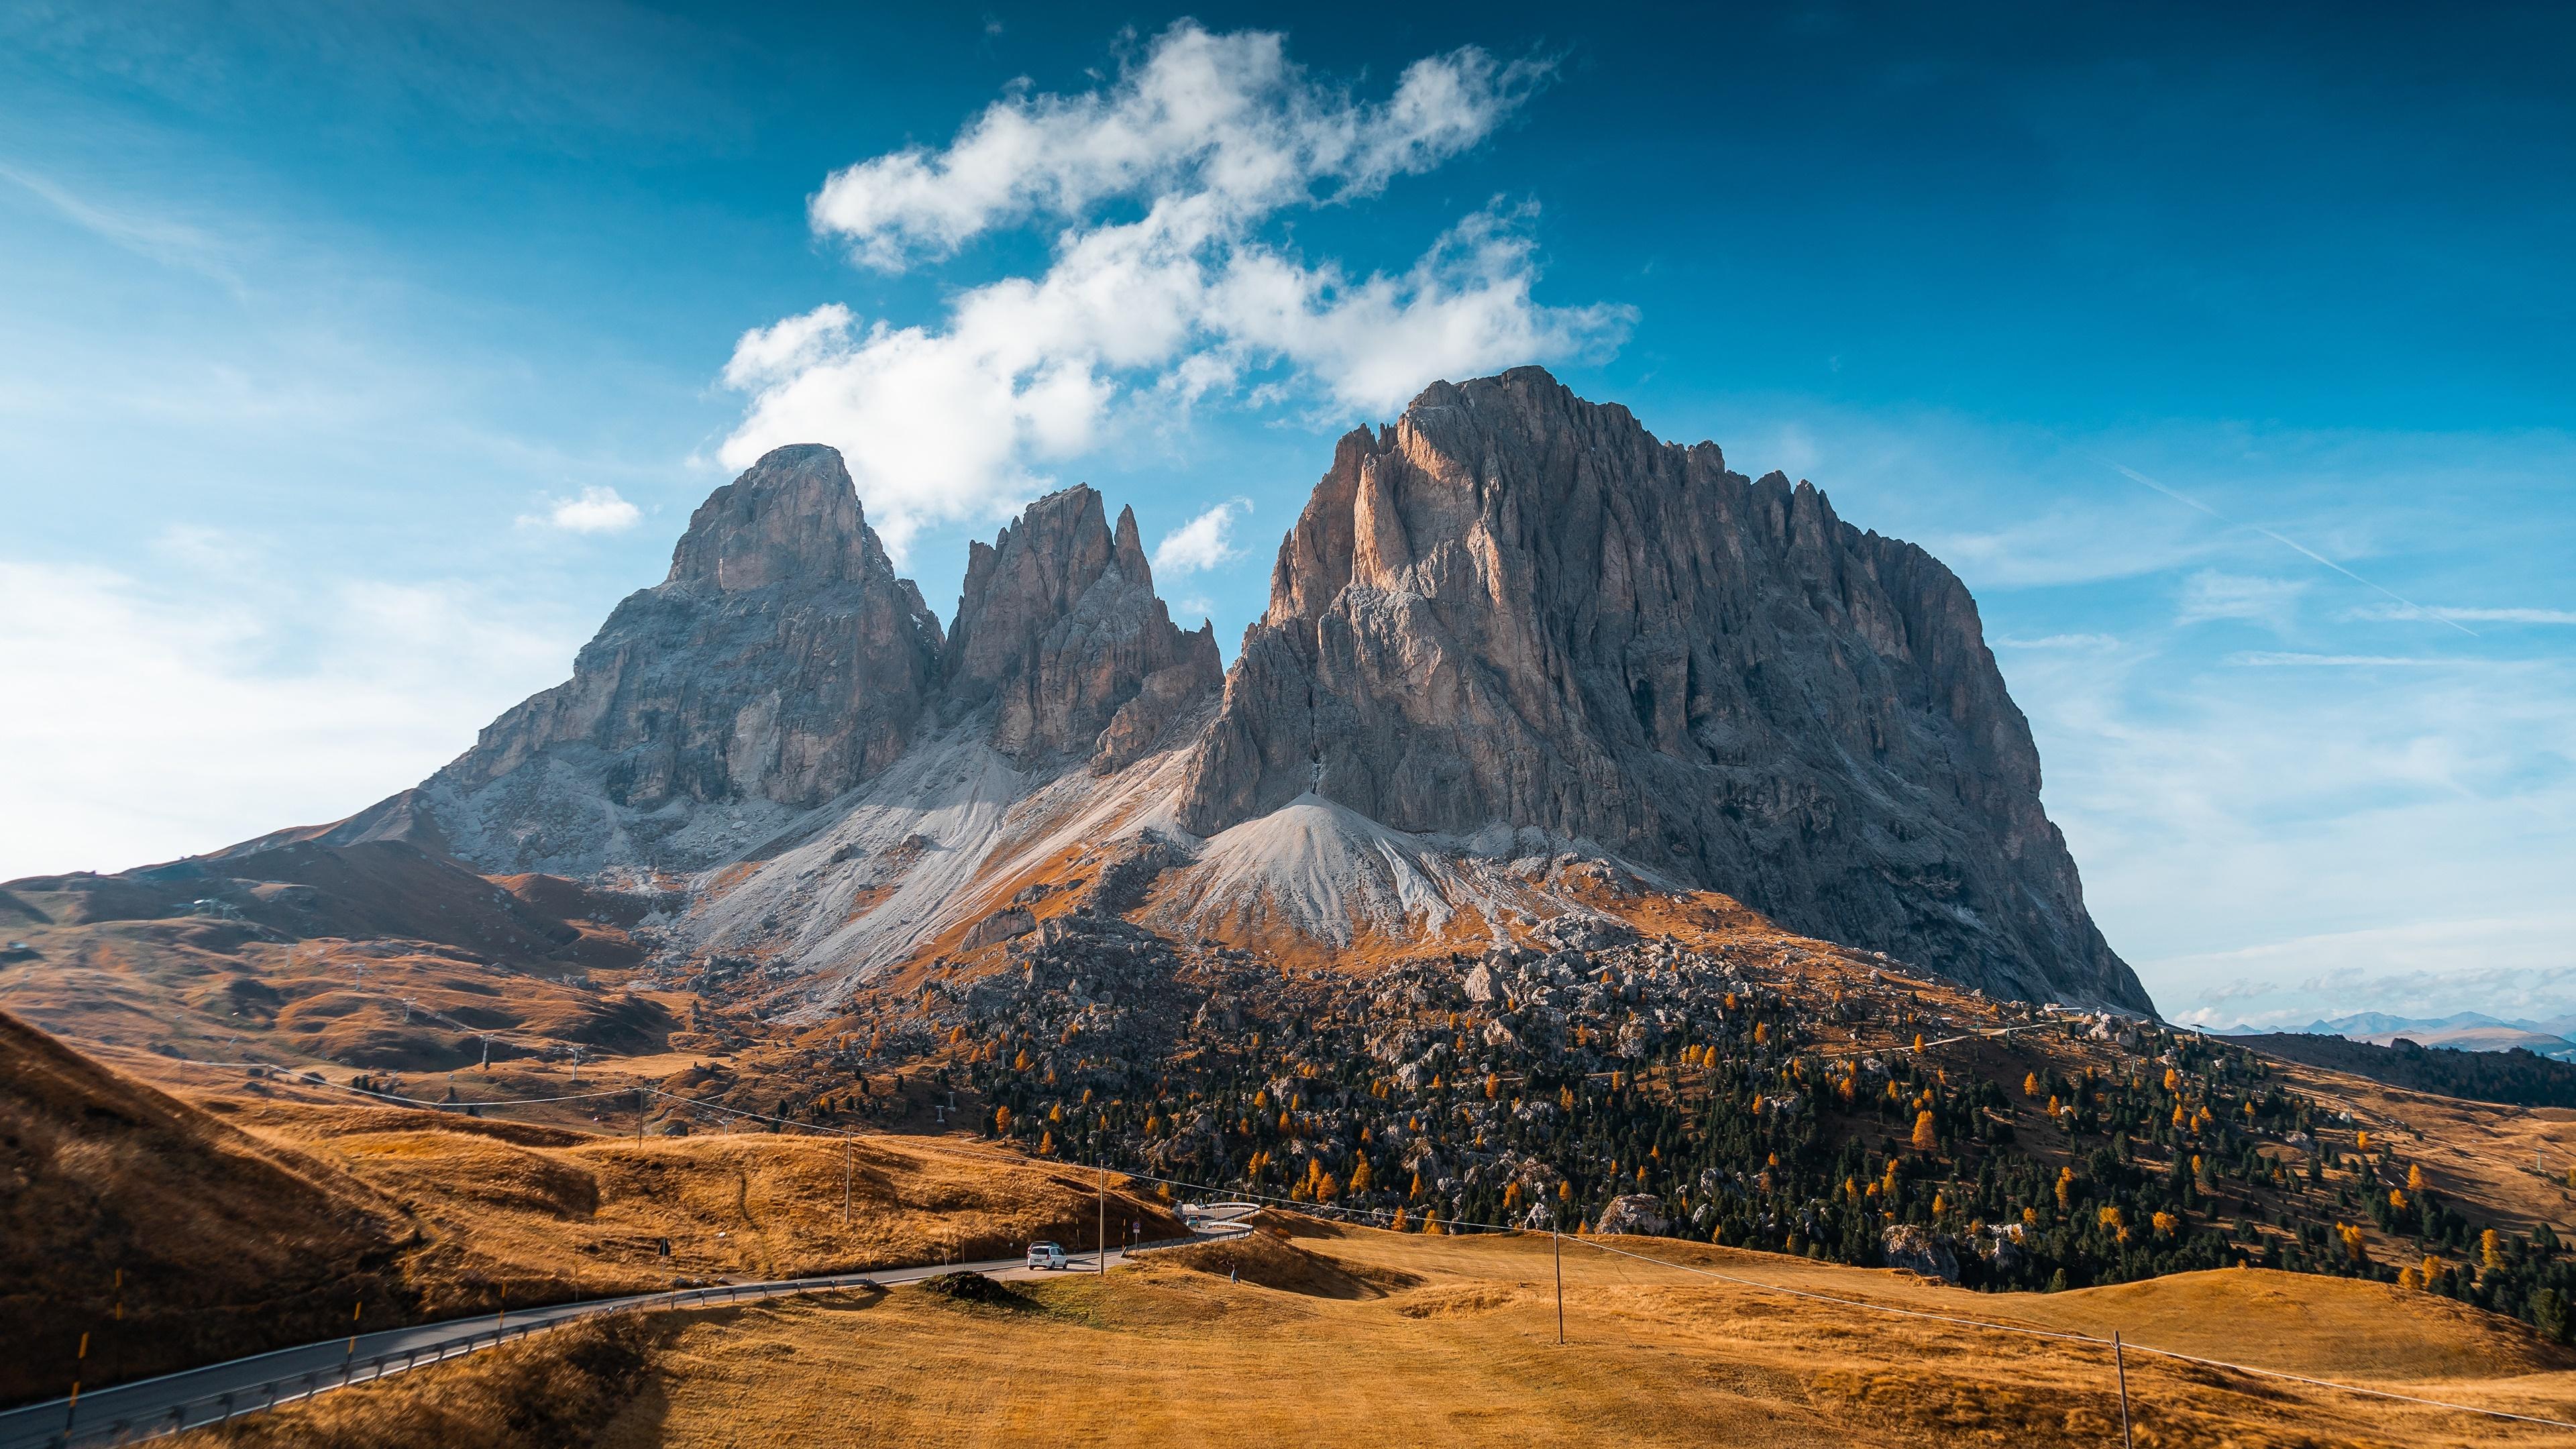 General 3840x2160 nature mountains sky road Dolomites (mountains) dolomite alps landscape rock rock formation